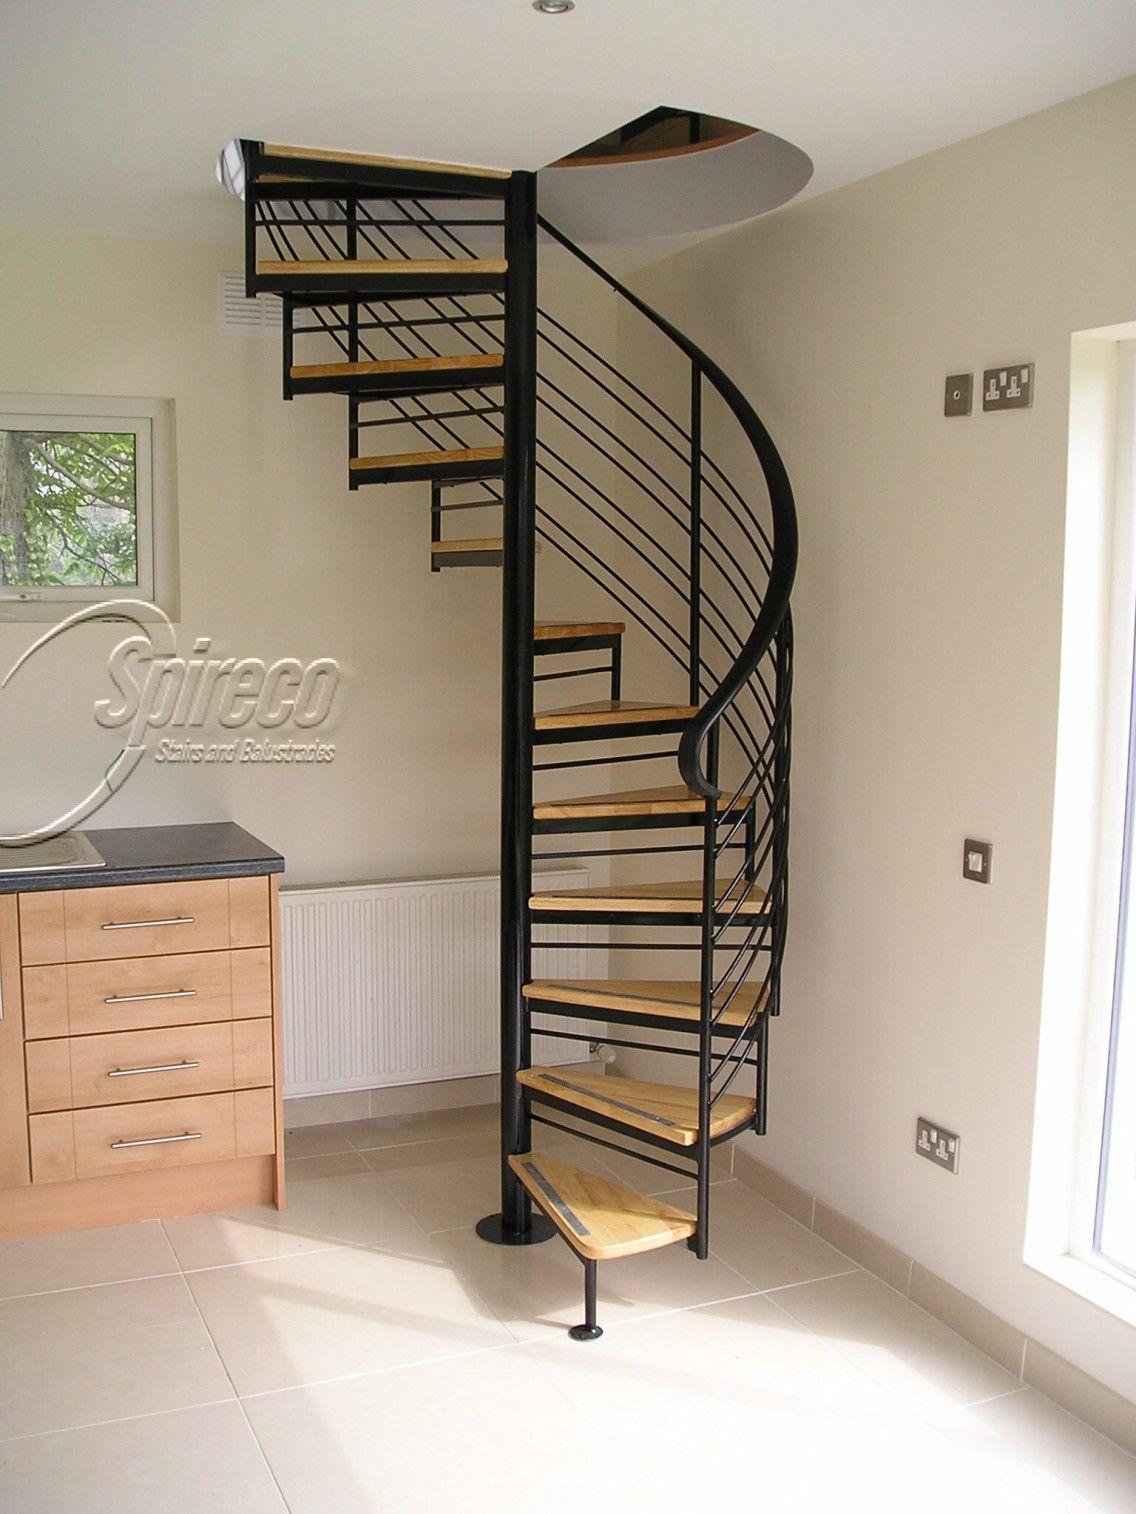 13 Amusing Stair Ladder Design Digital Image Ideas Stairs Design Staircase Design Tiny House Stairs